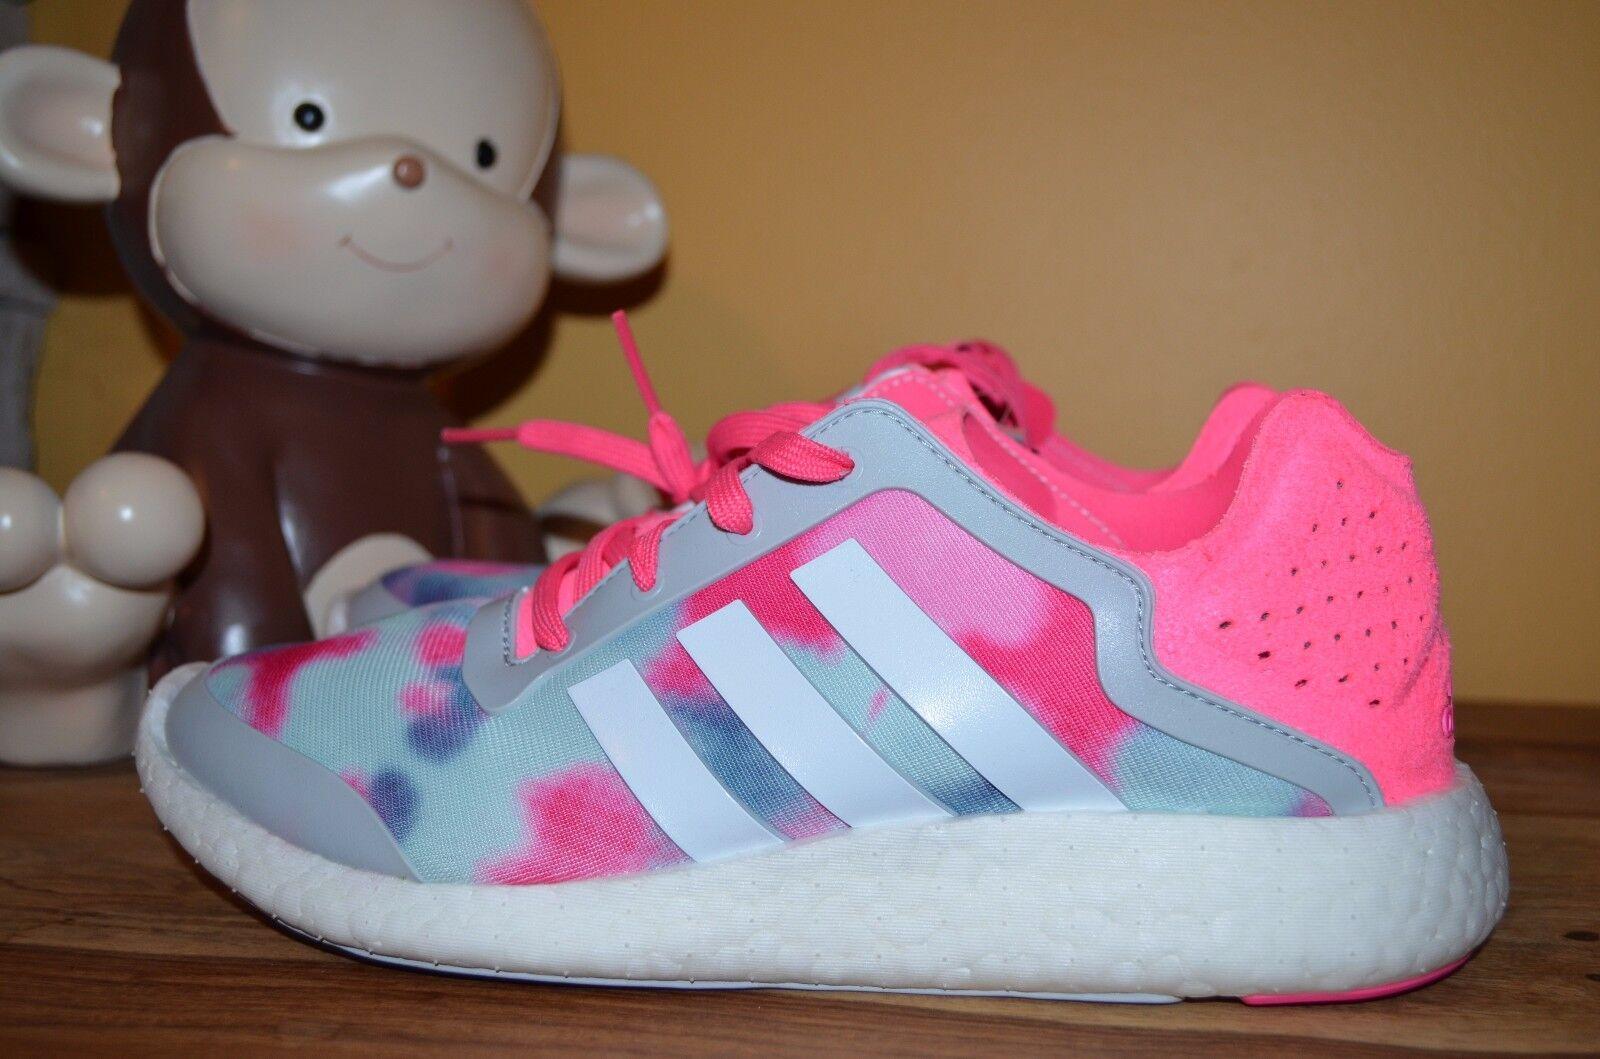 New wmns adidas pureboost w scarpette rosa / b26503 bianco / grigio 8,5 b26503 / puro slancio 8ac7e4